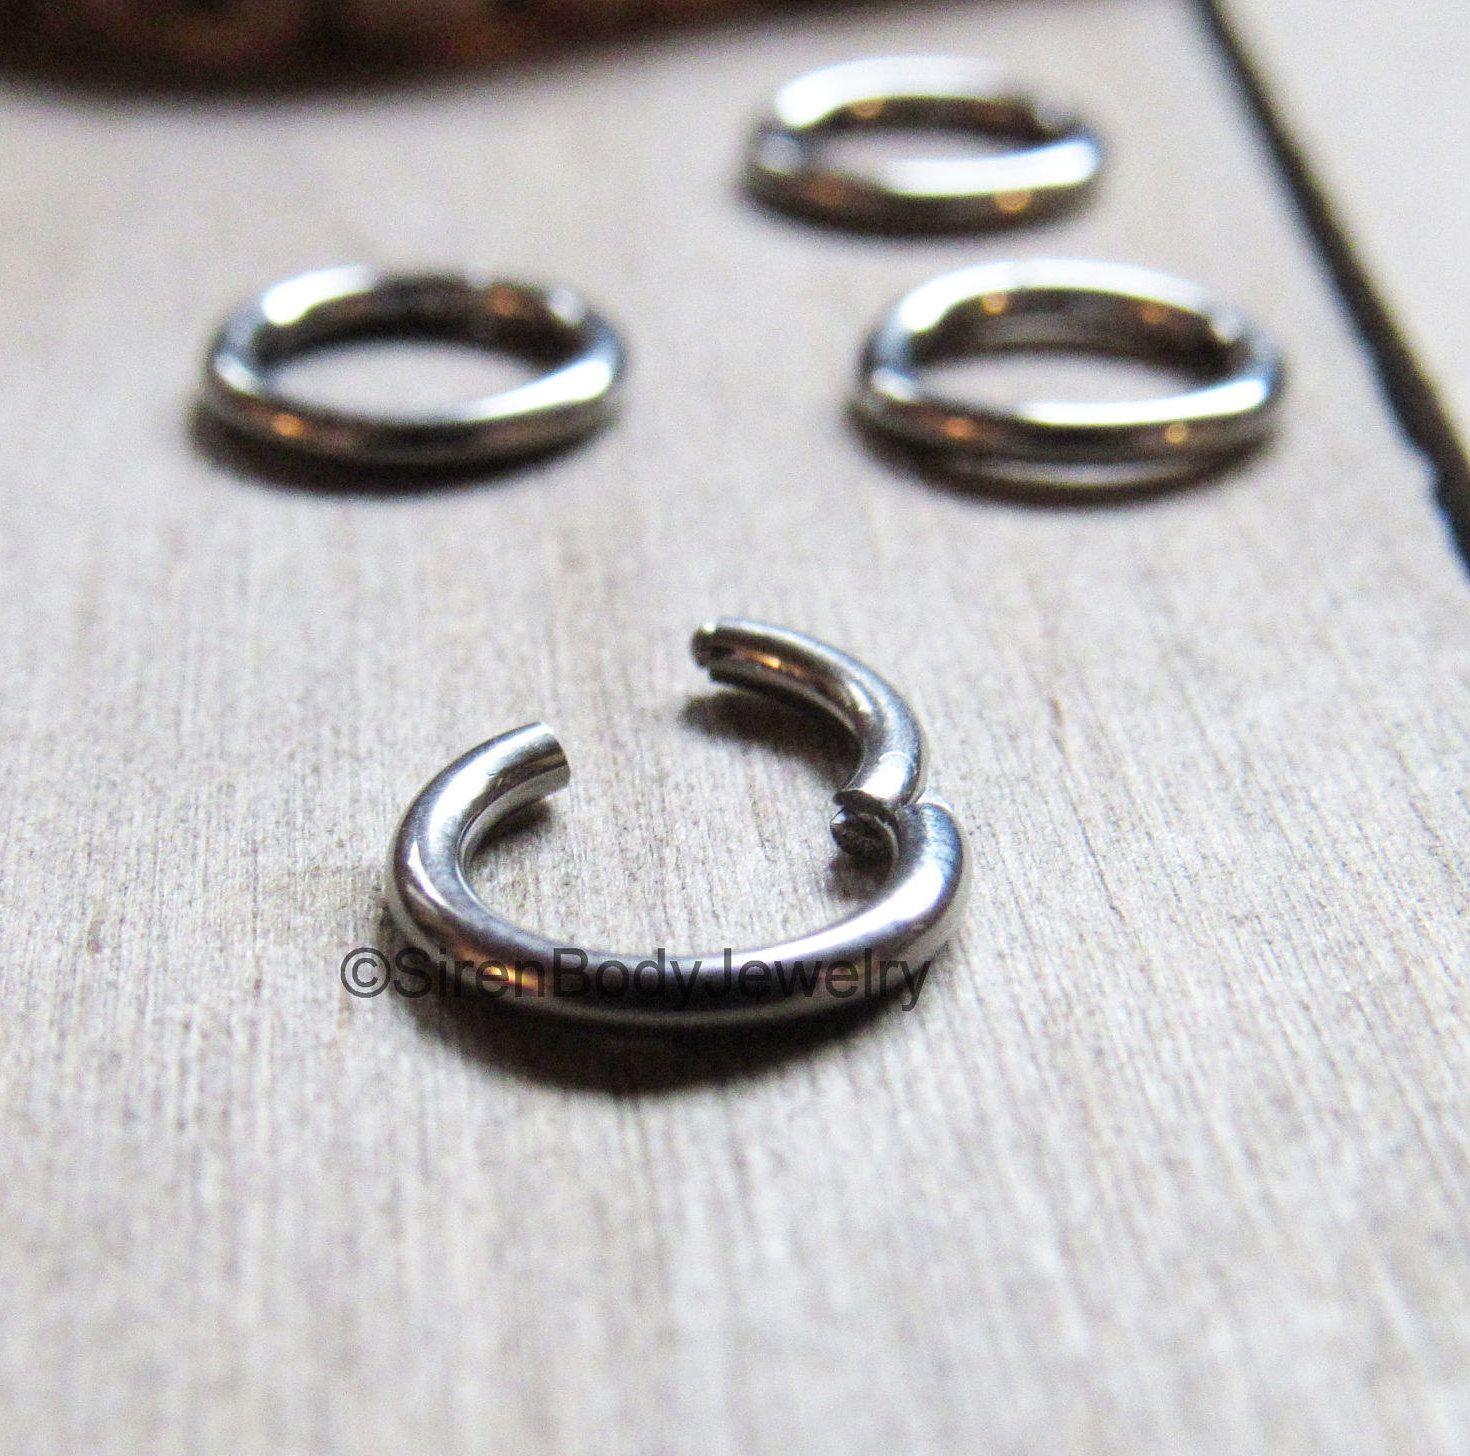 Tiny septum piercing hinged segment ring daith earring small ...